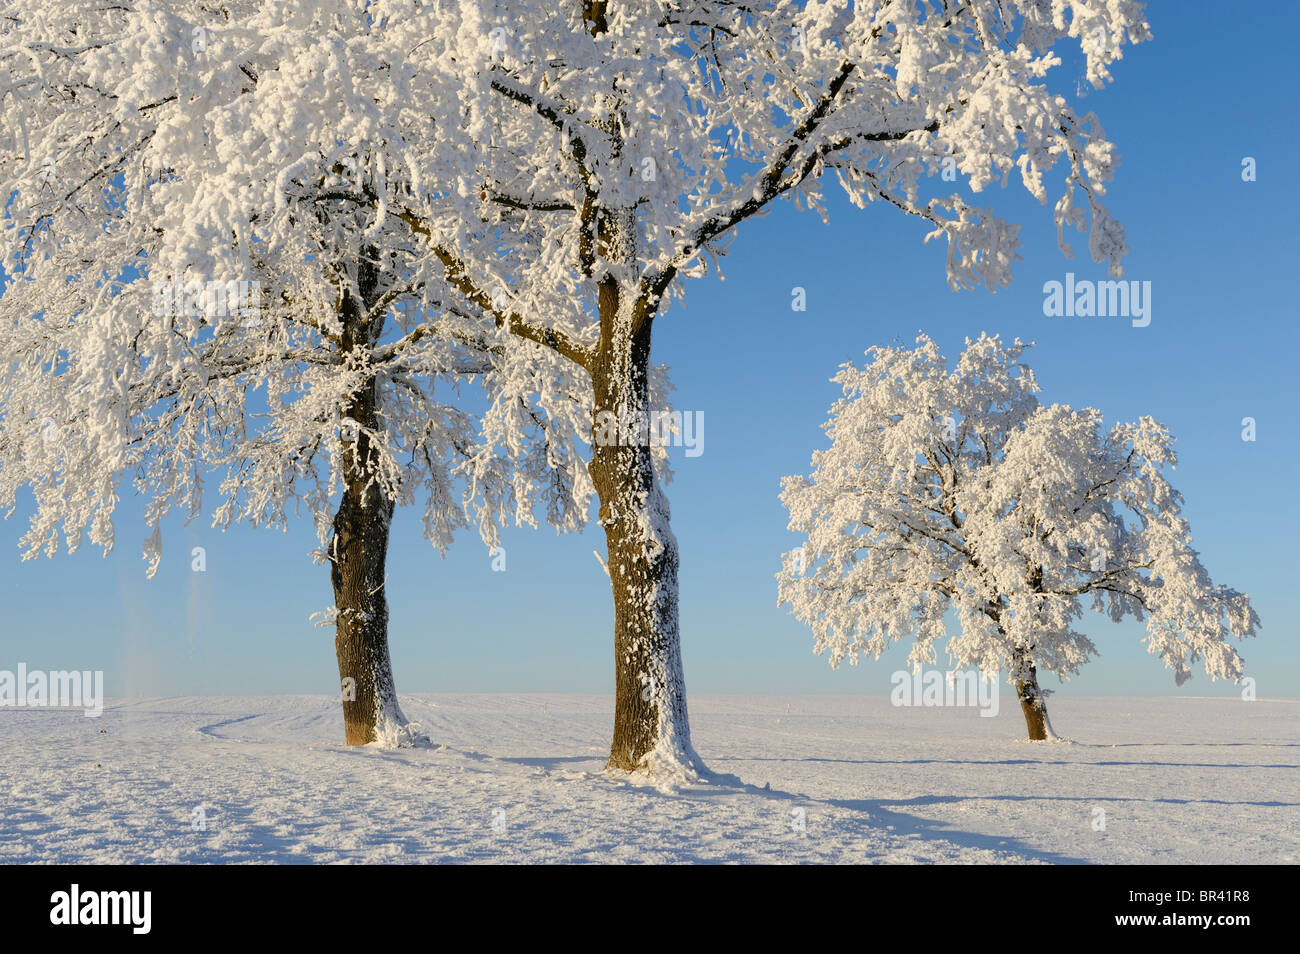 Pedunculate Oak (Quercus robur), coated with white frost, Lindeberg, Aargau, Switzerland, Europe - Stock Image